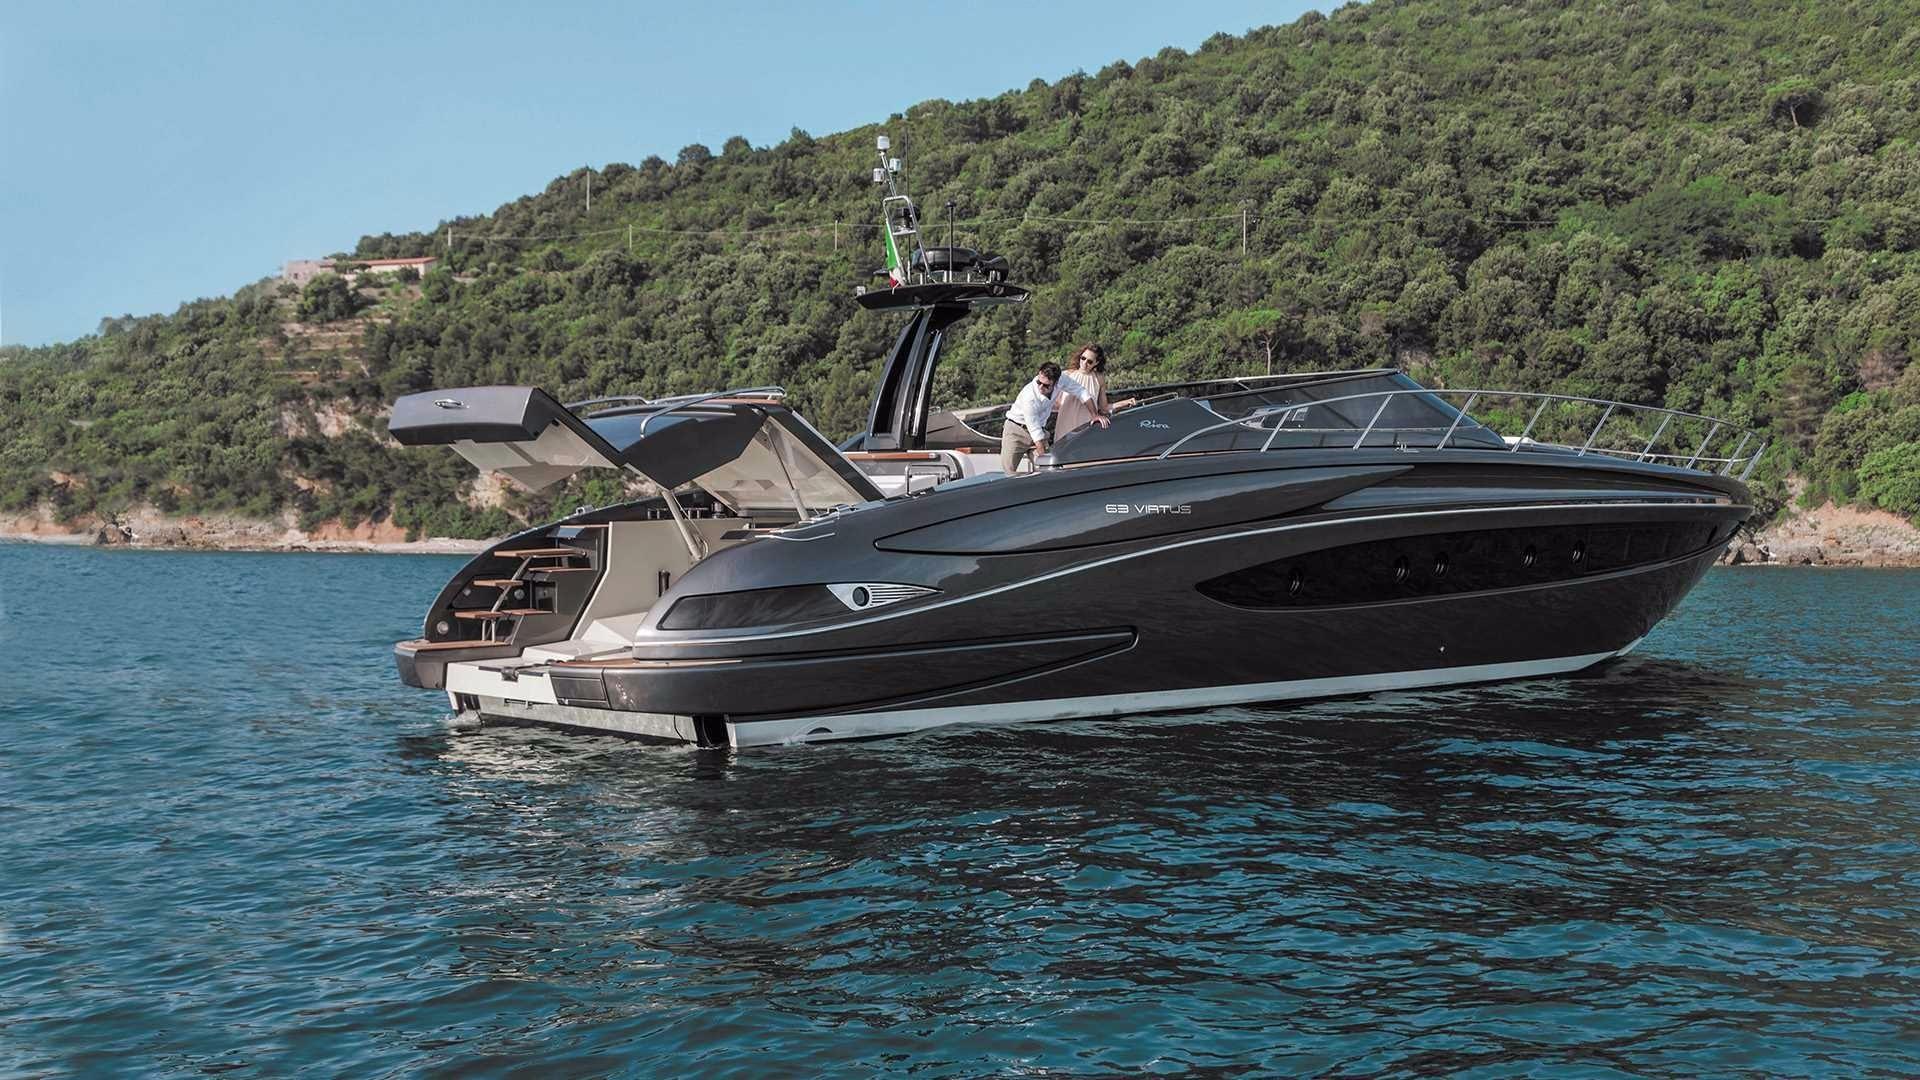 2017 Riva 63 Virtus Power Boat For Sale Wwwyachtworldcom